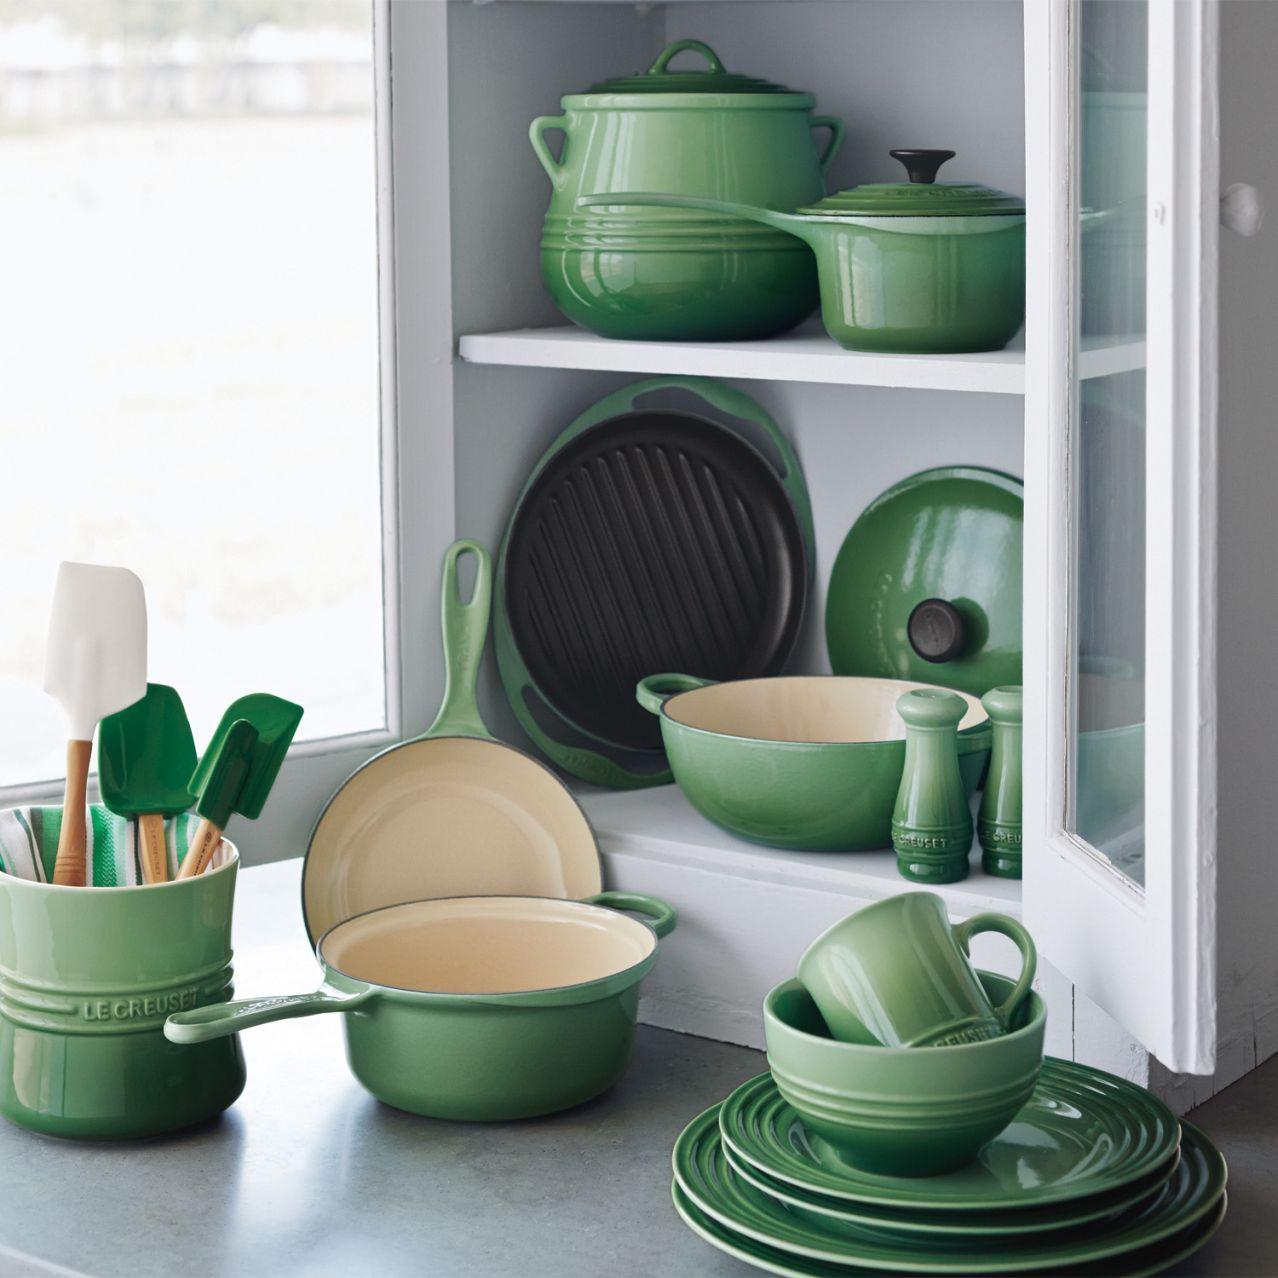 Le Creuset Rosemary Dinnerware Set & Le Creuset Rosemary Dinnerware Set | future kitchen | Pinterest ...